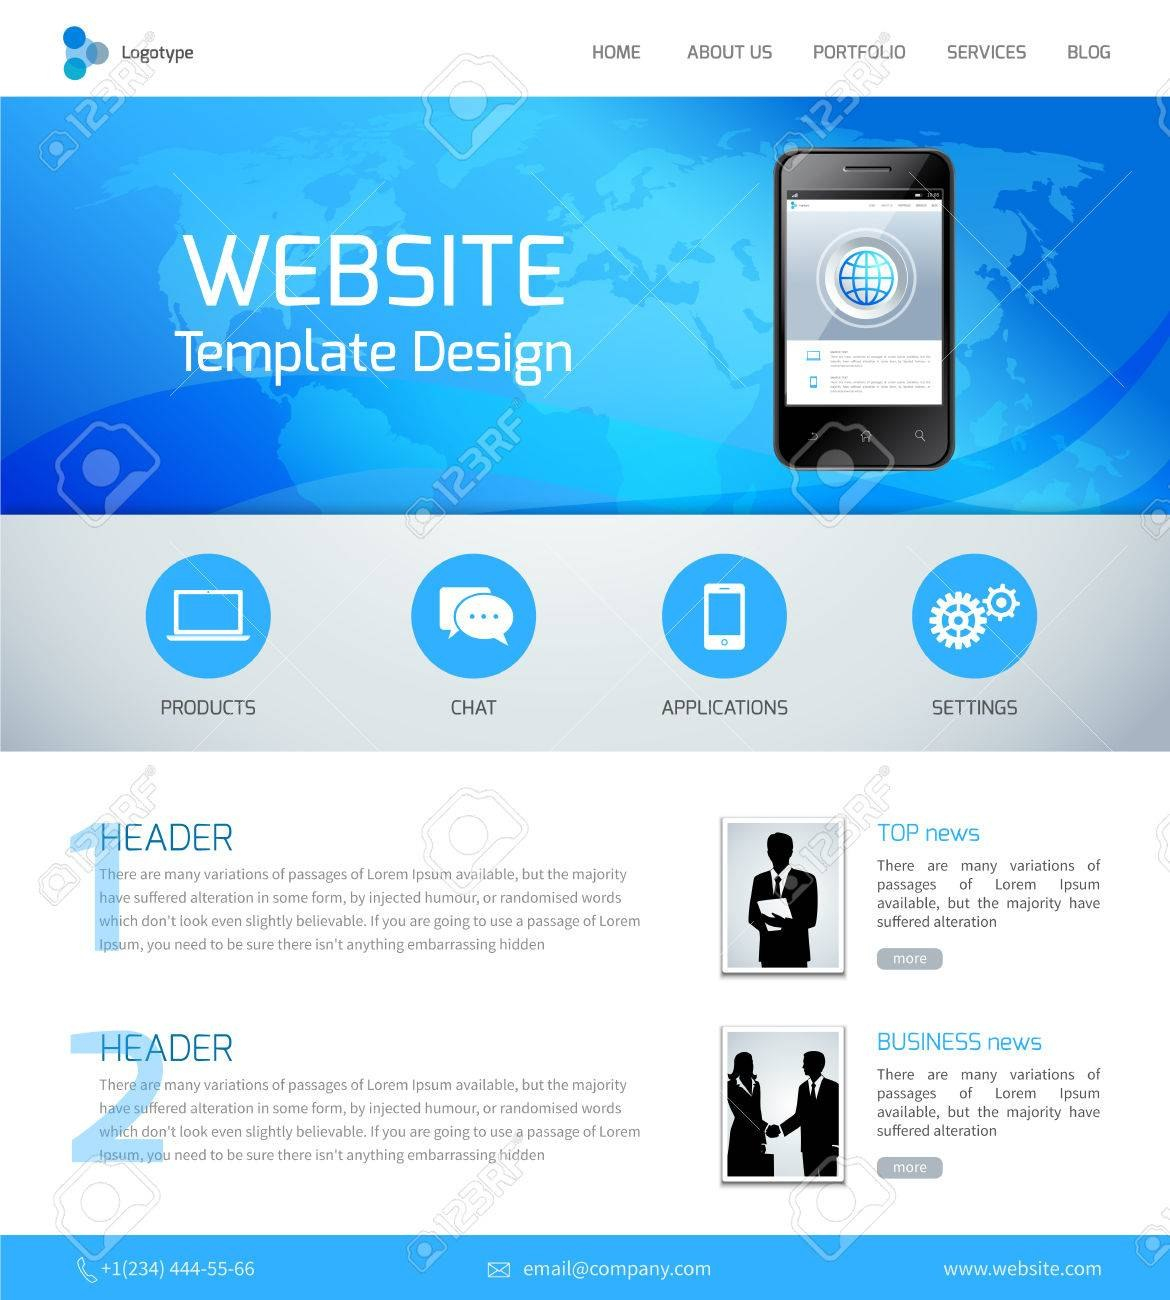 Website Design Template With Menu And Navigation Layout Elements Regarding Free Website Menu Design Templates